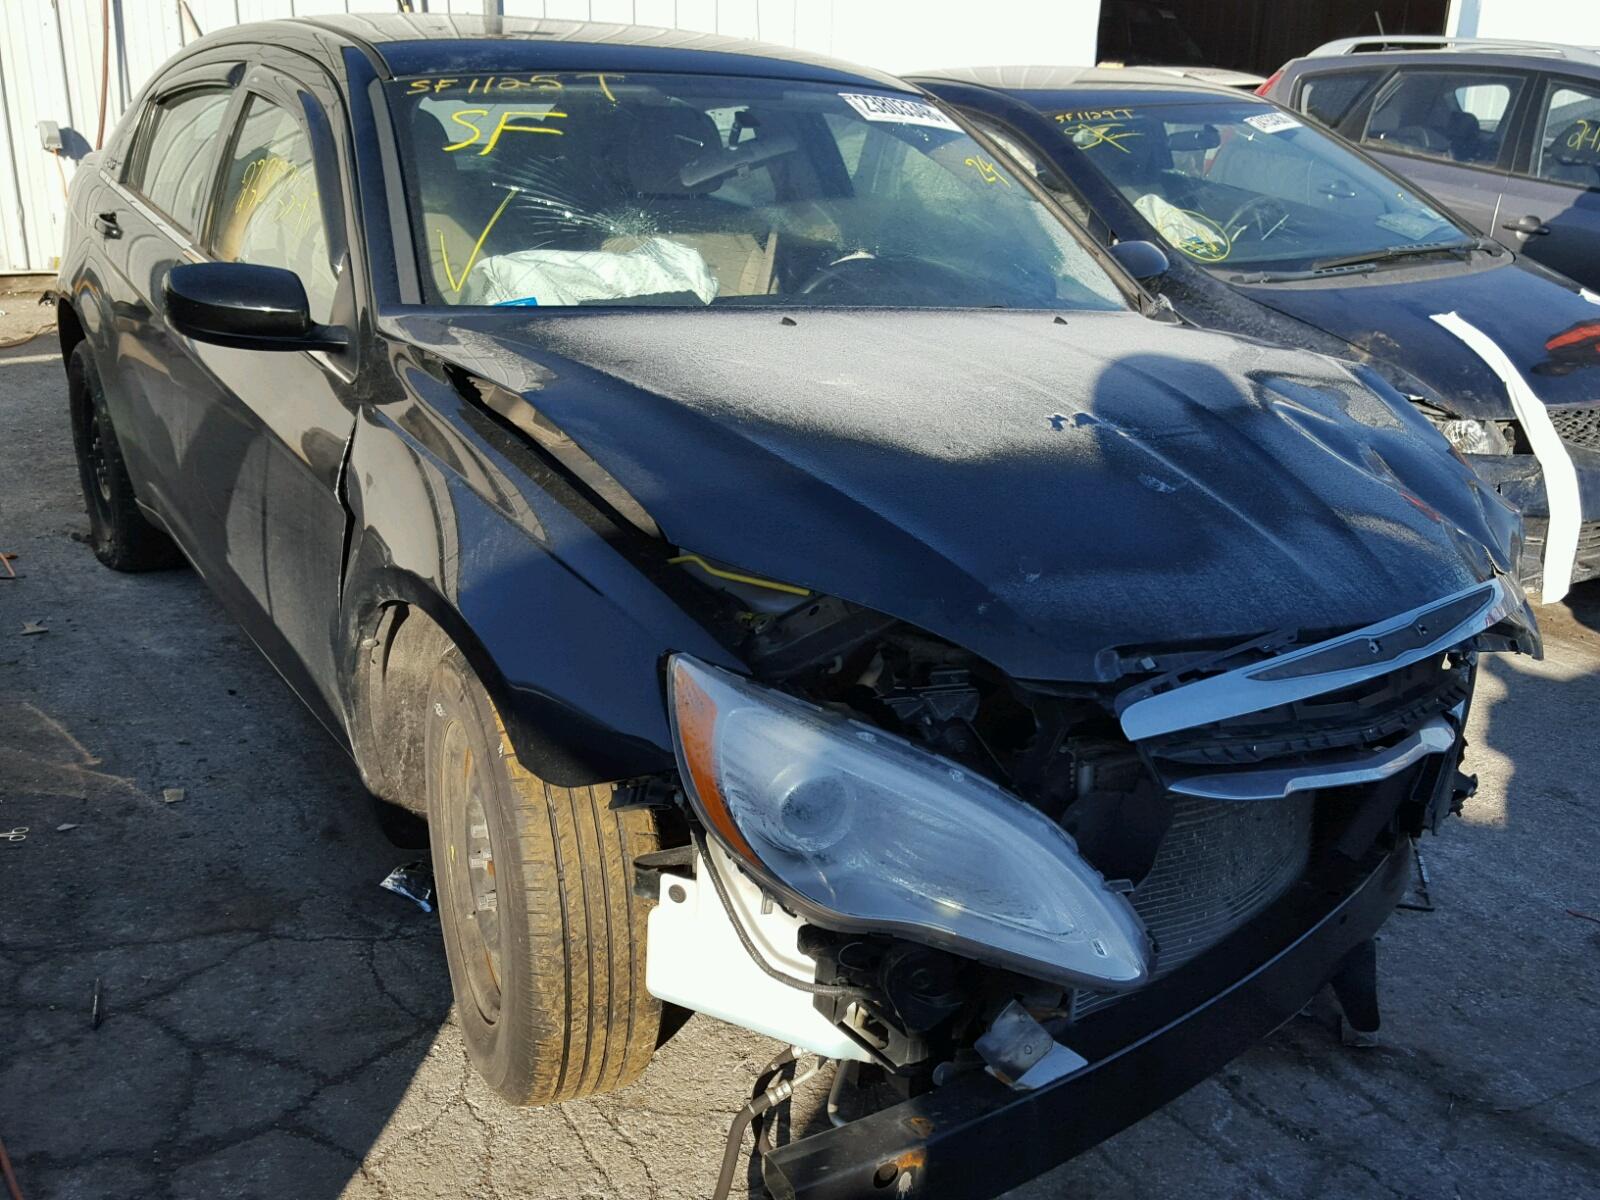 features photos lx price exterior sedan reviews chrysler